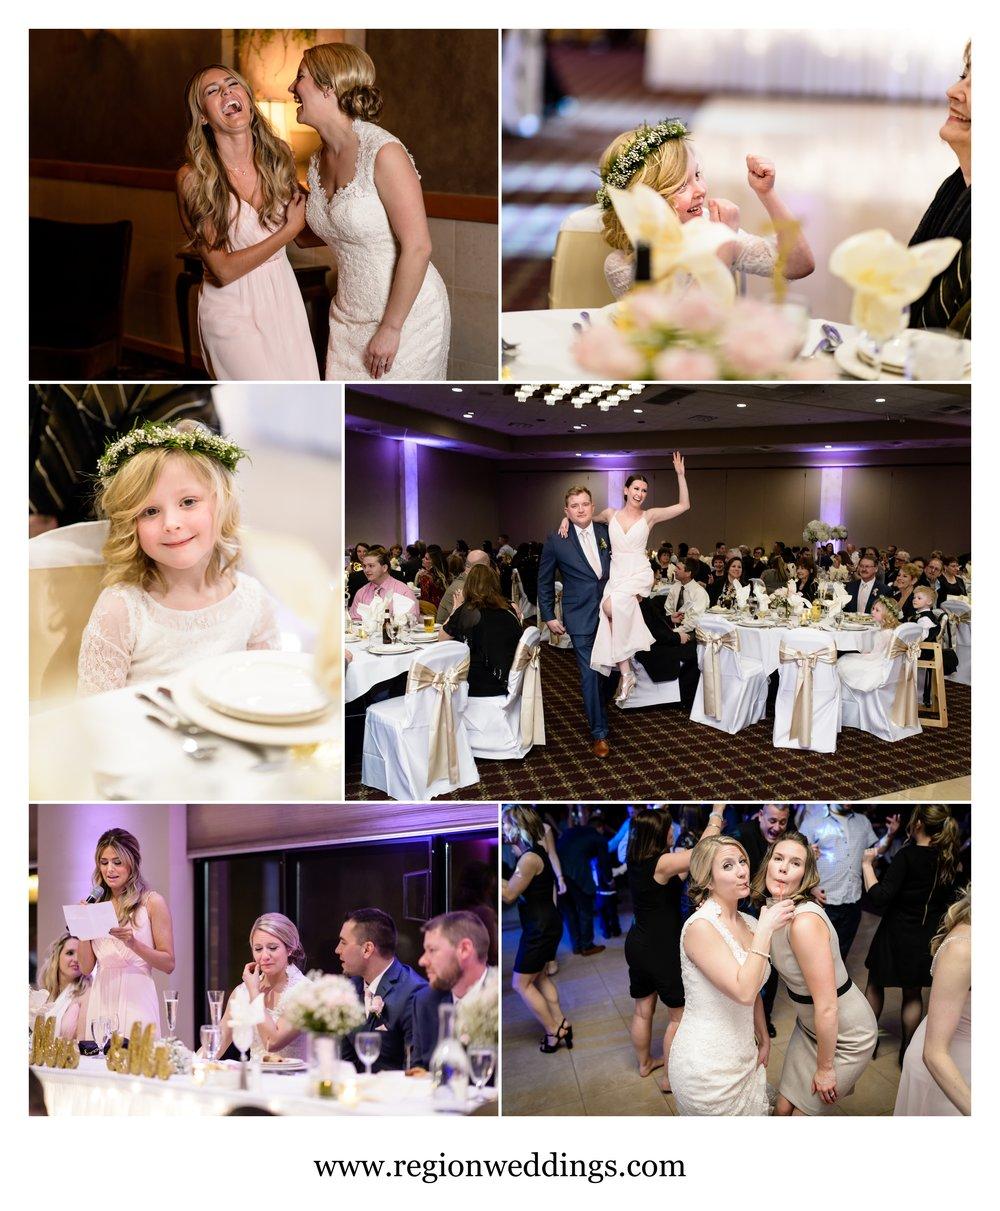 Fun and emotional moments at a Villa Cesare wedding reception.